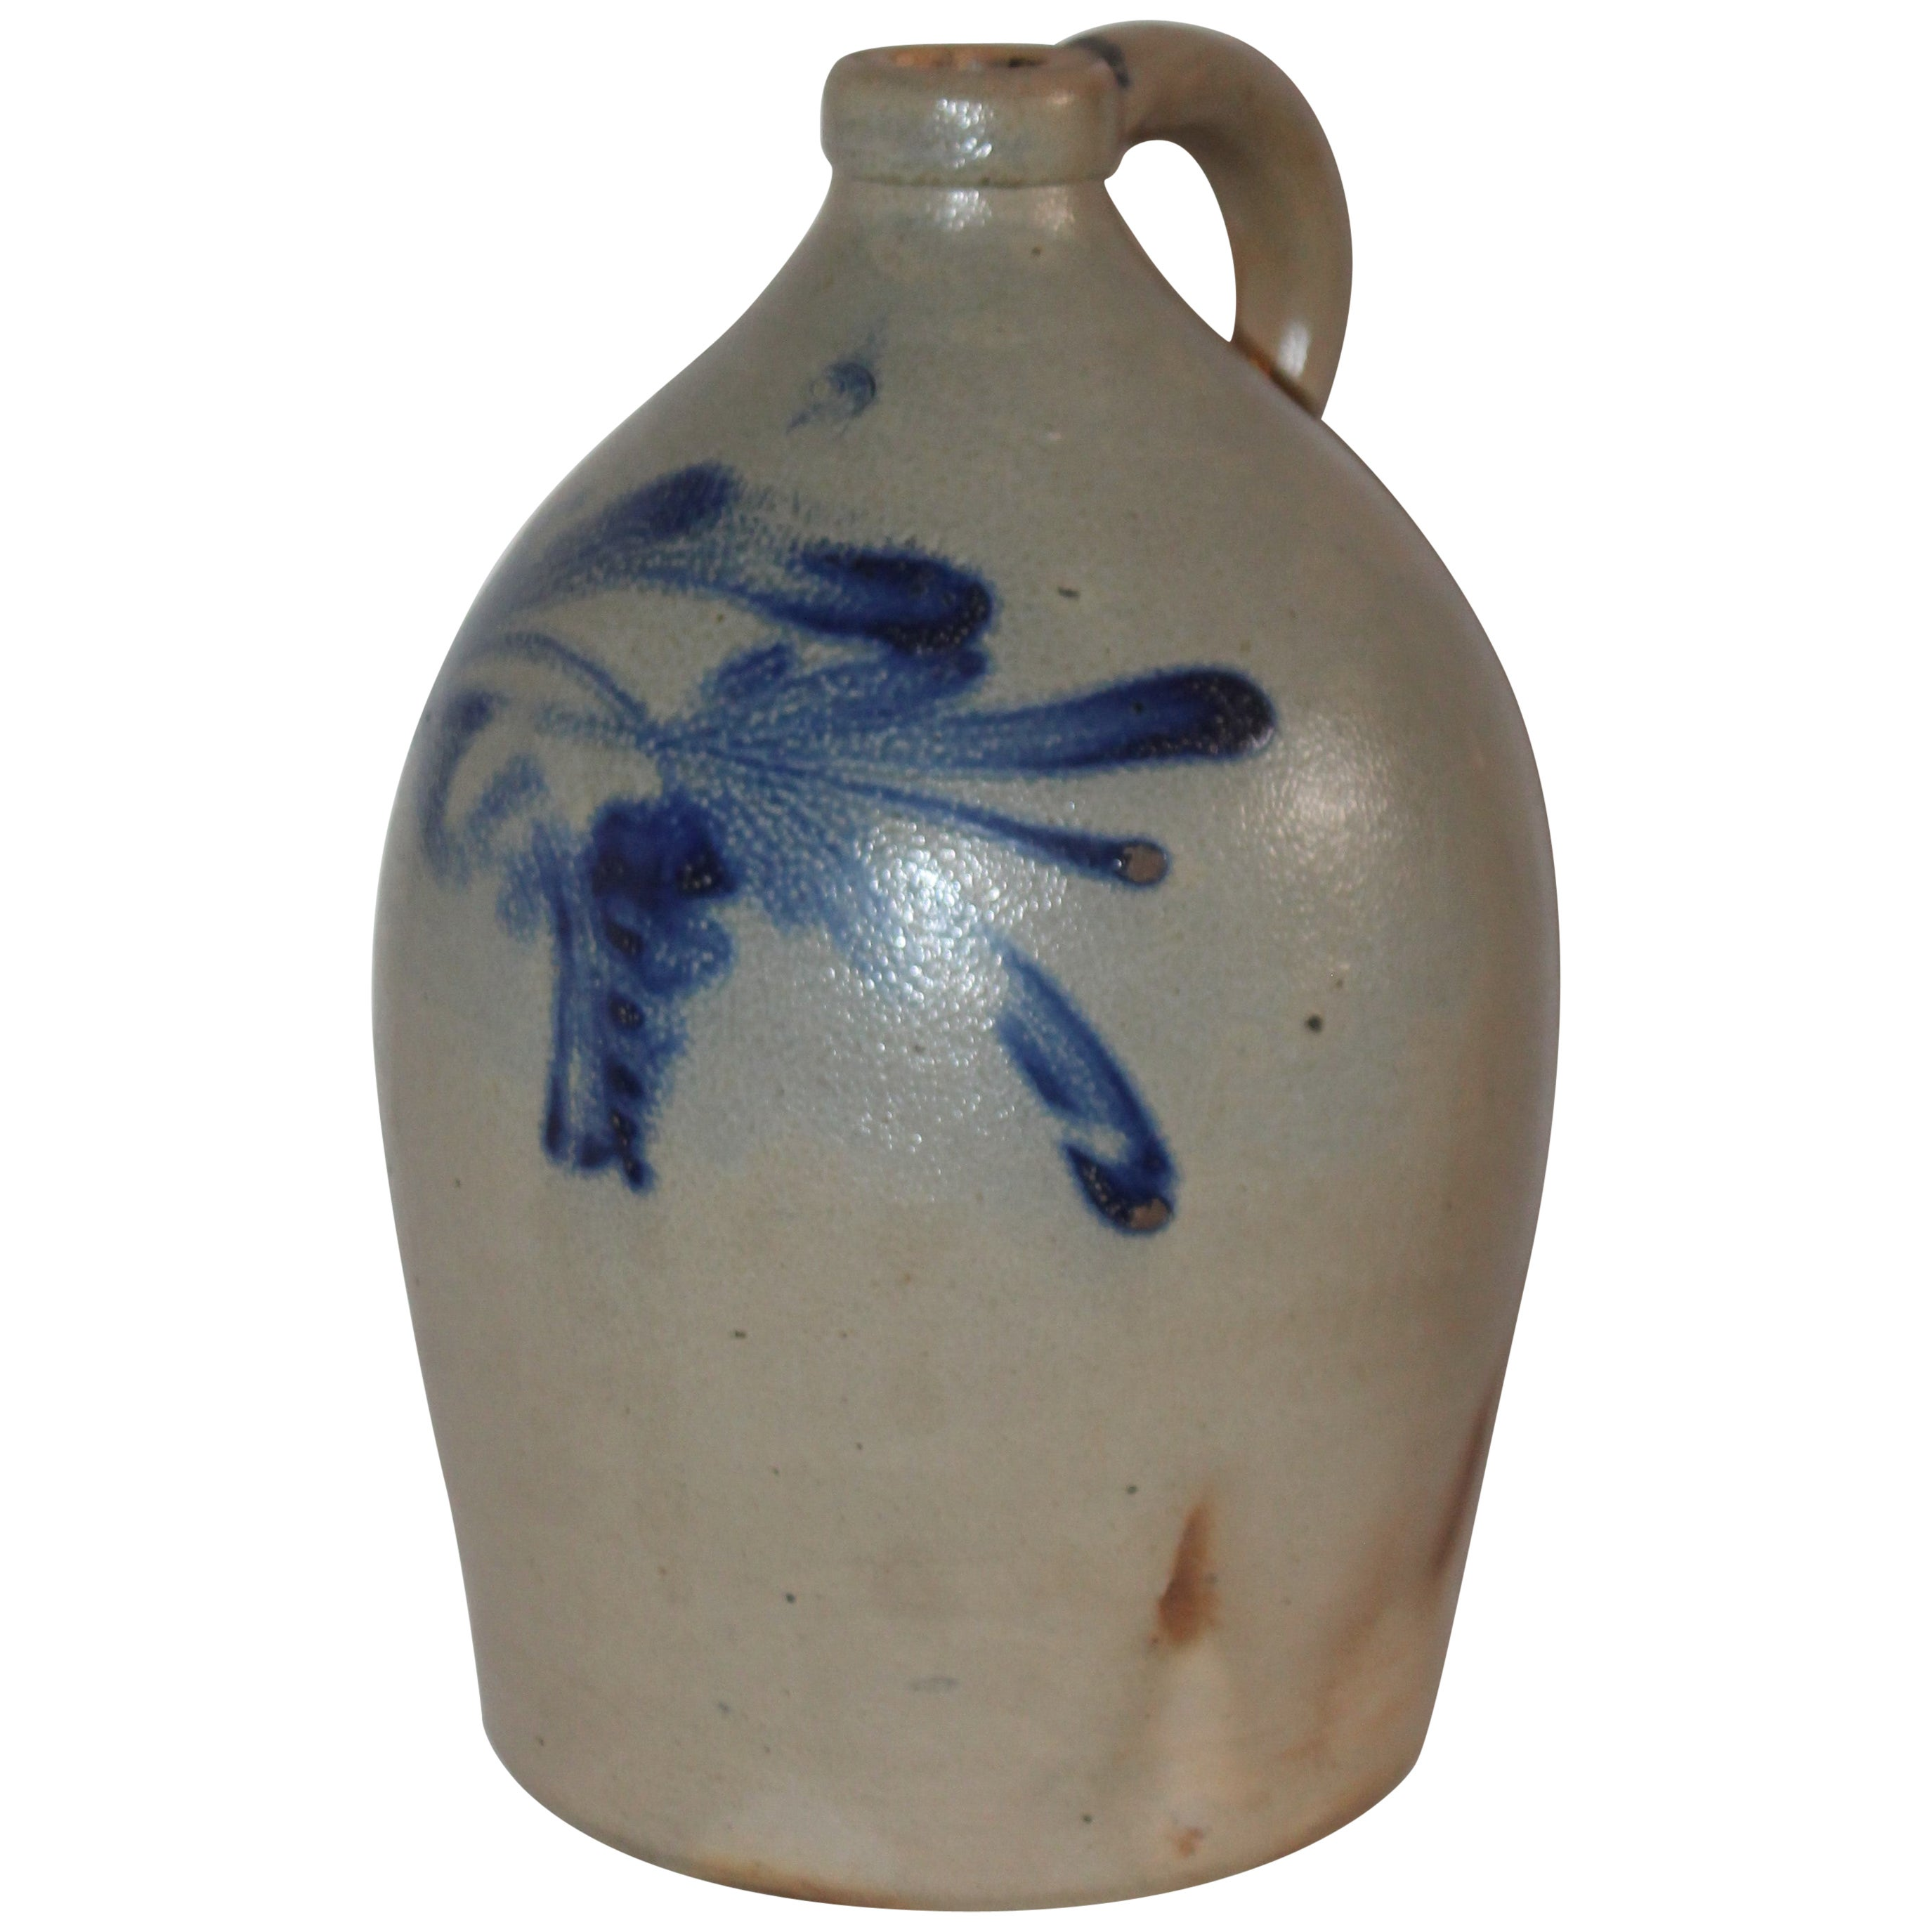 19th Century Cowden Wilcox Decorated Stoneware Jug